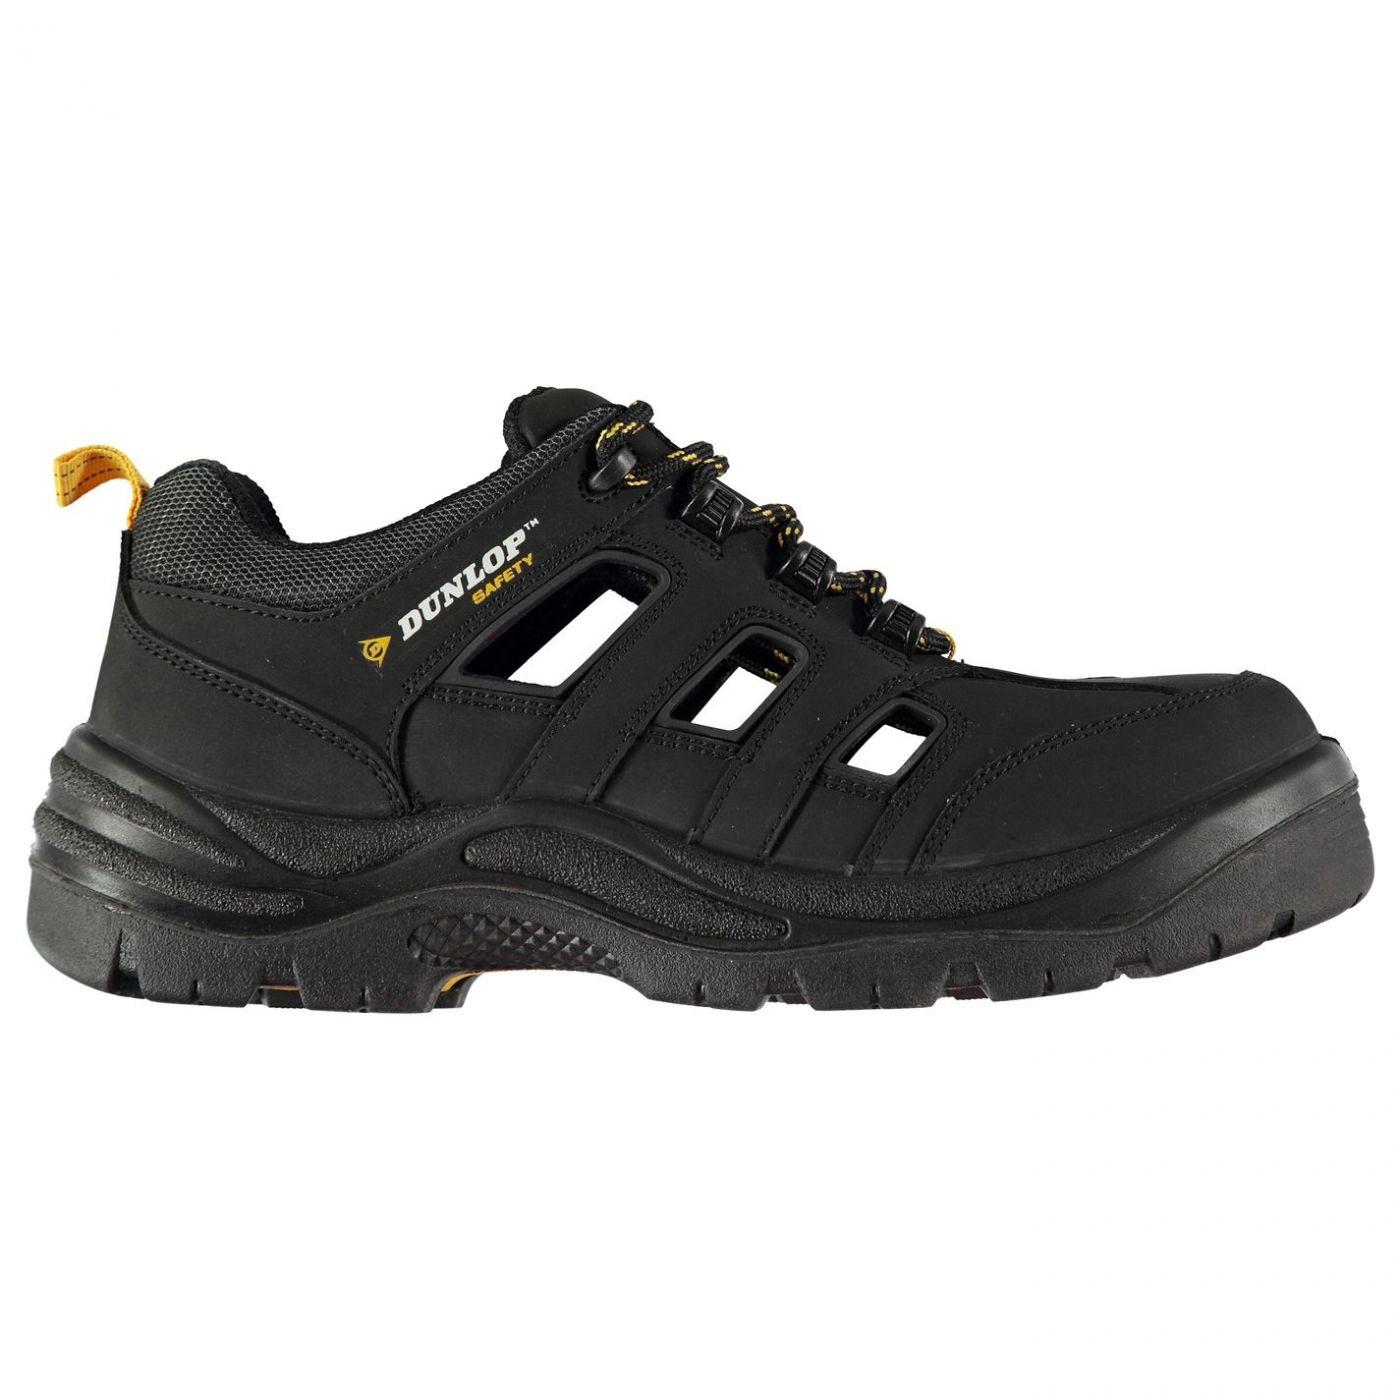 8e67c36eb15 Dunlop Hawaii Mens Safety Boots - FACTCOOL